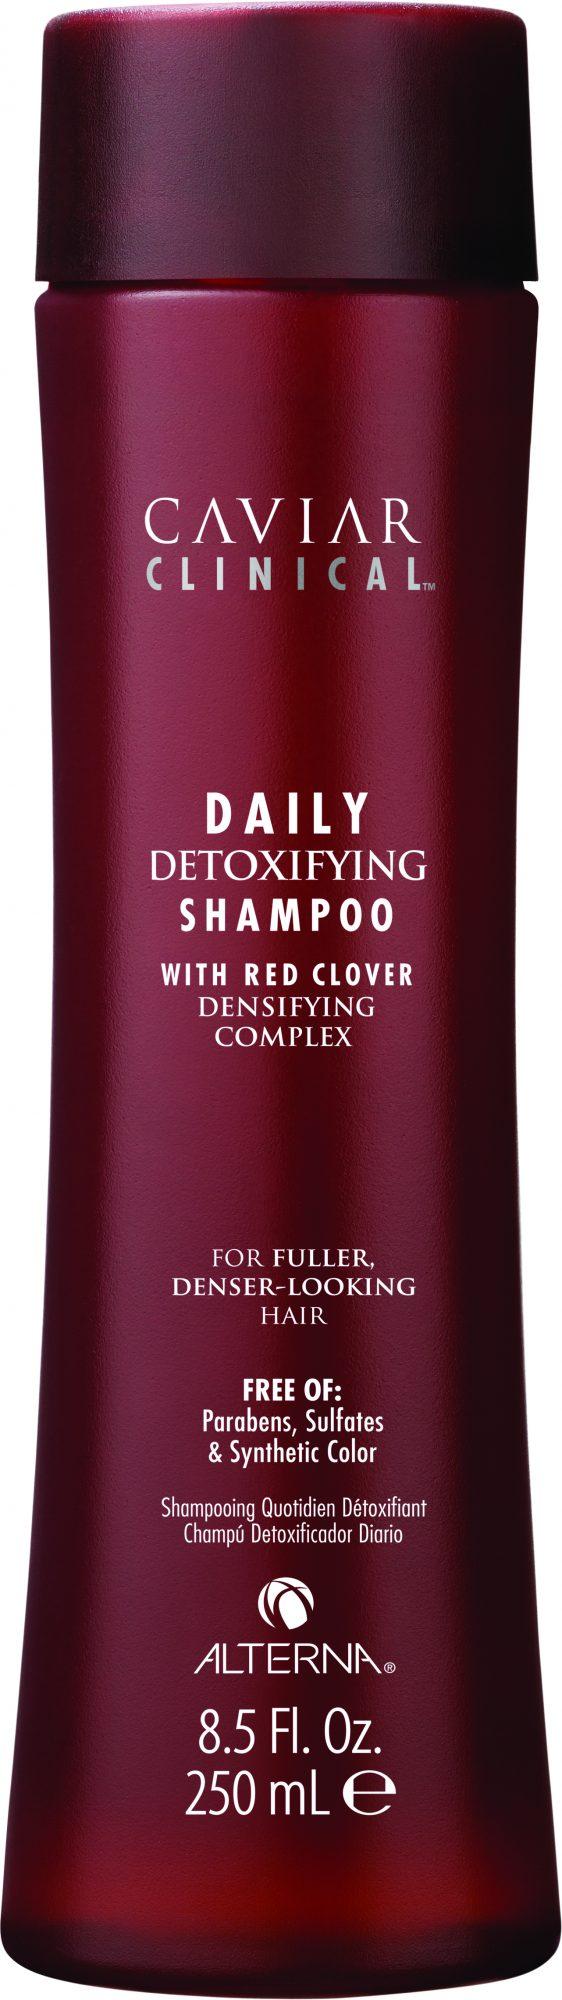 clarifying-shampoo-alterna.jpg